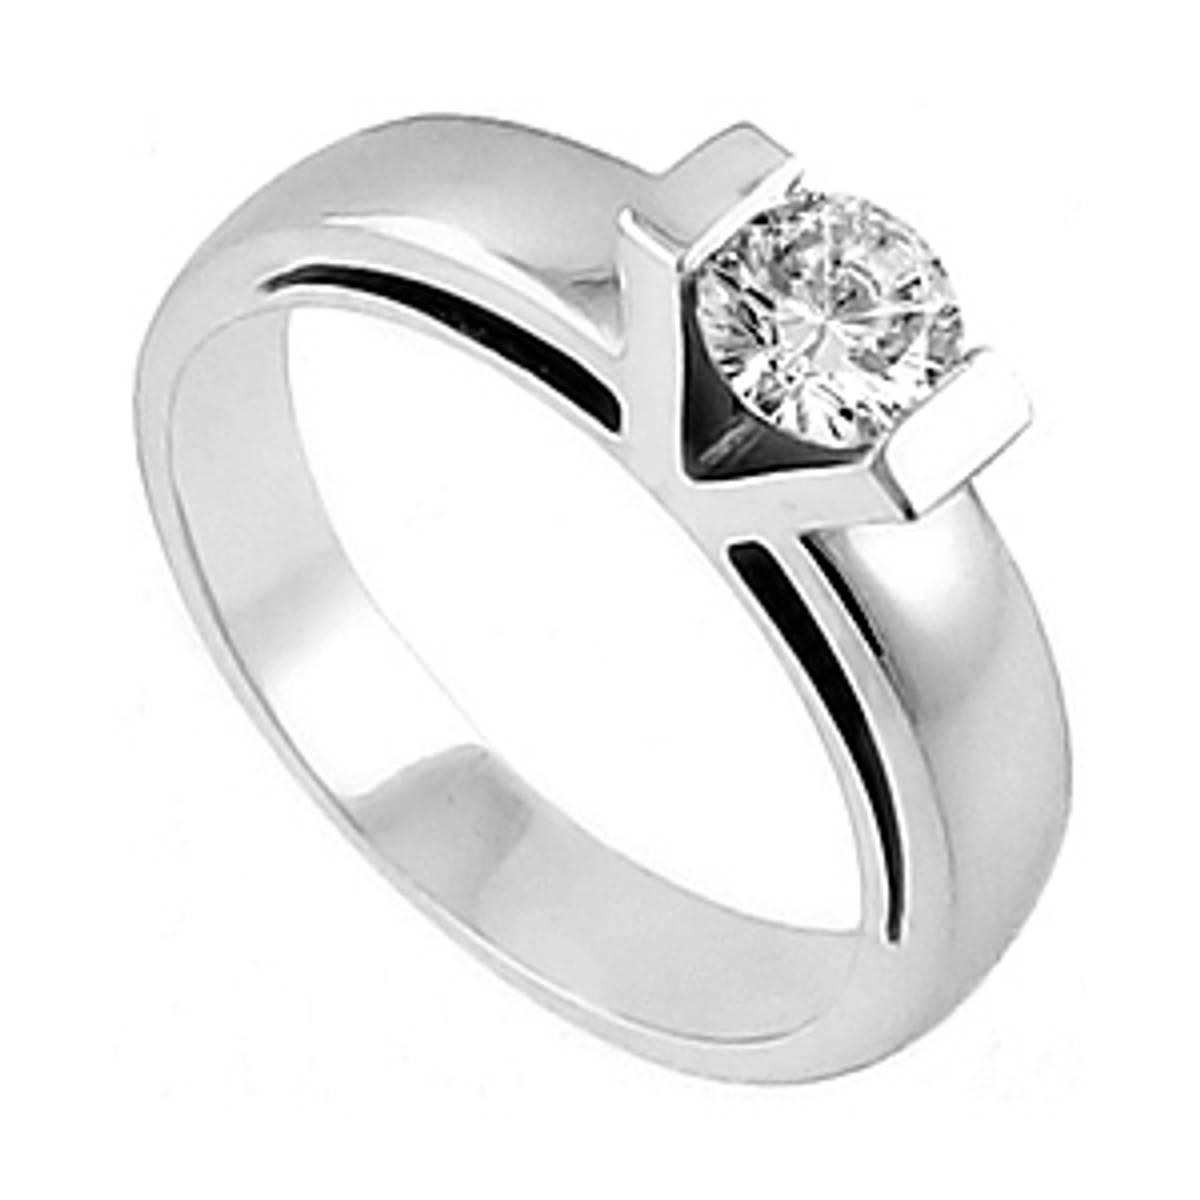 DR72289Brilliant cut diamond solitaire ringPictured item: 0.51cts diamond set in 18k white goldimage 70587